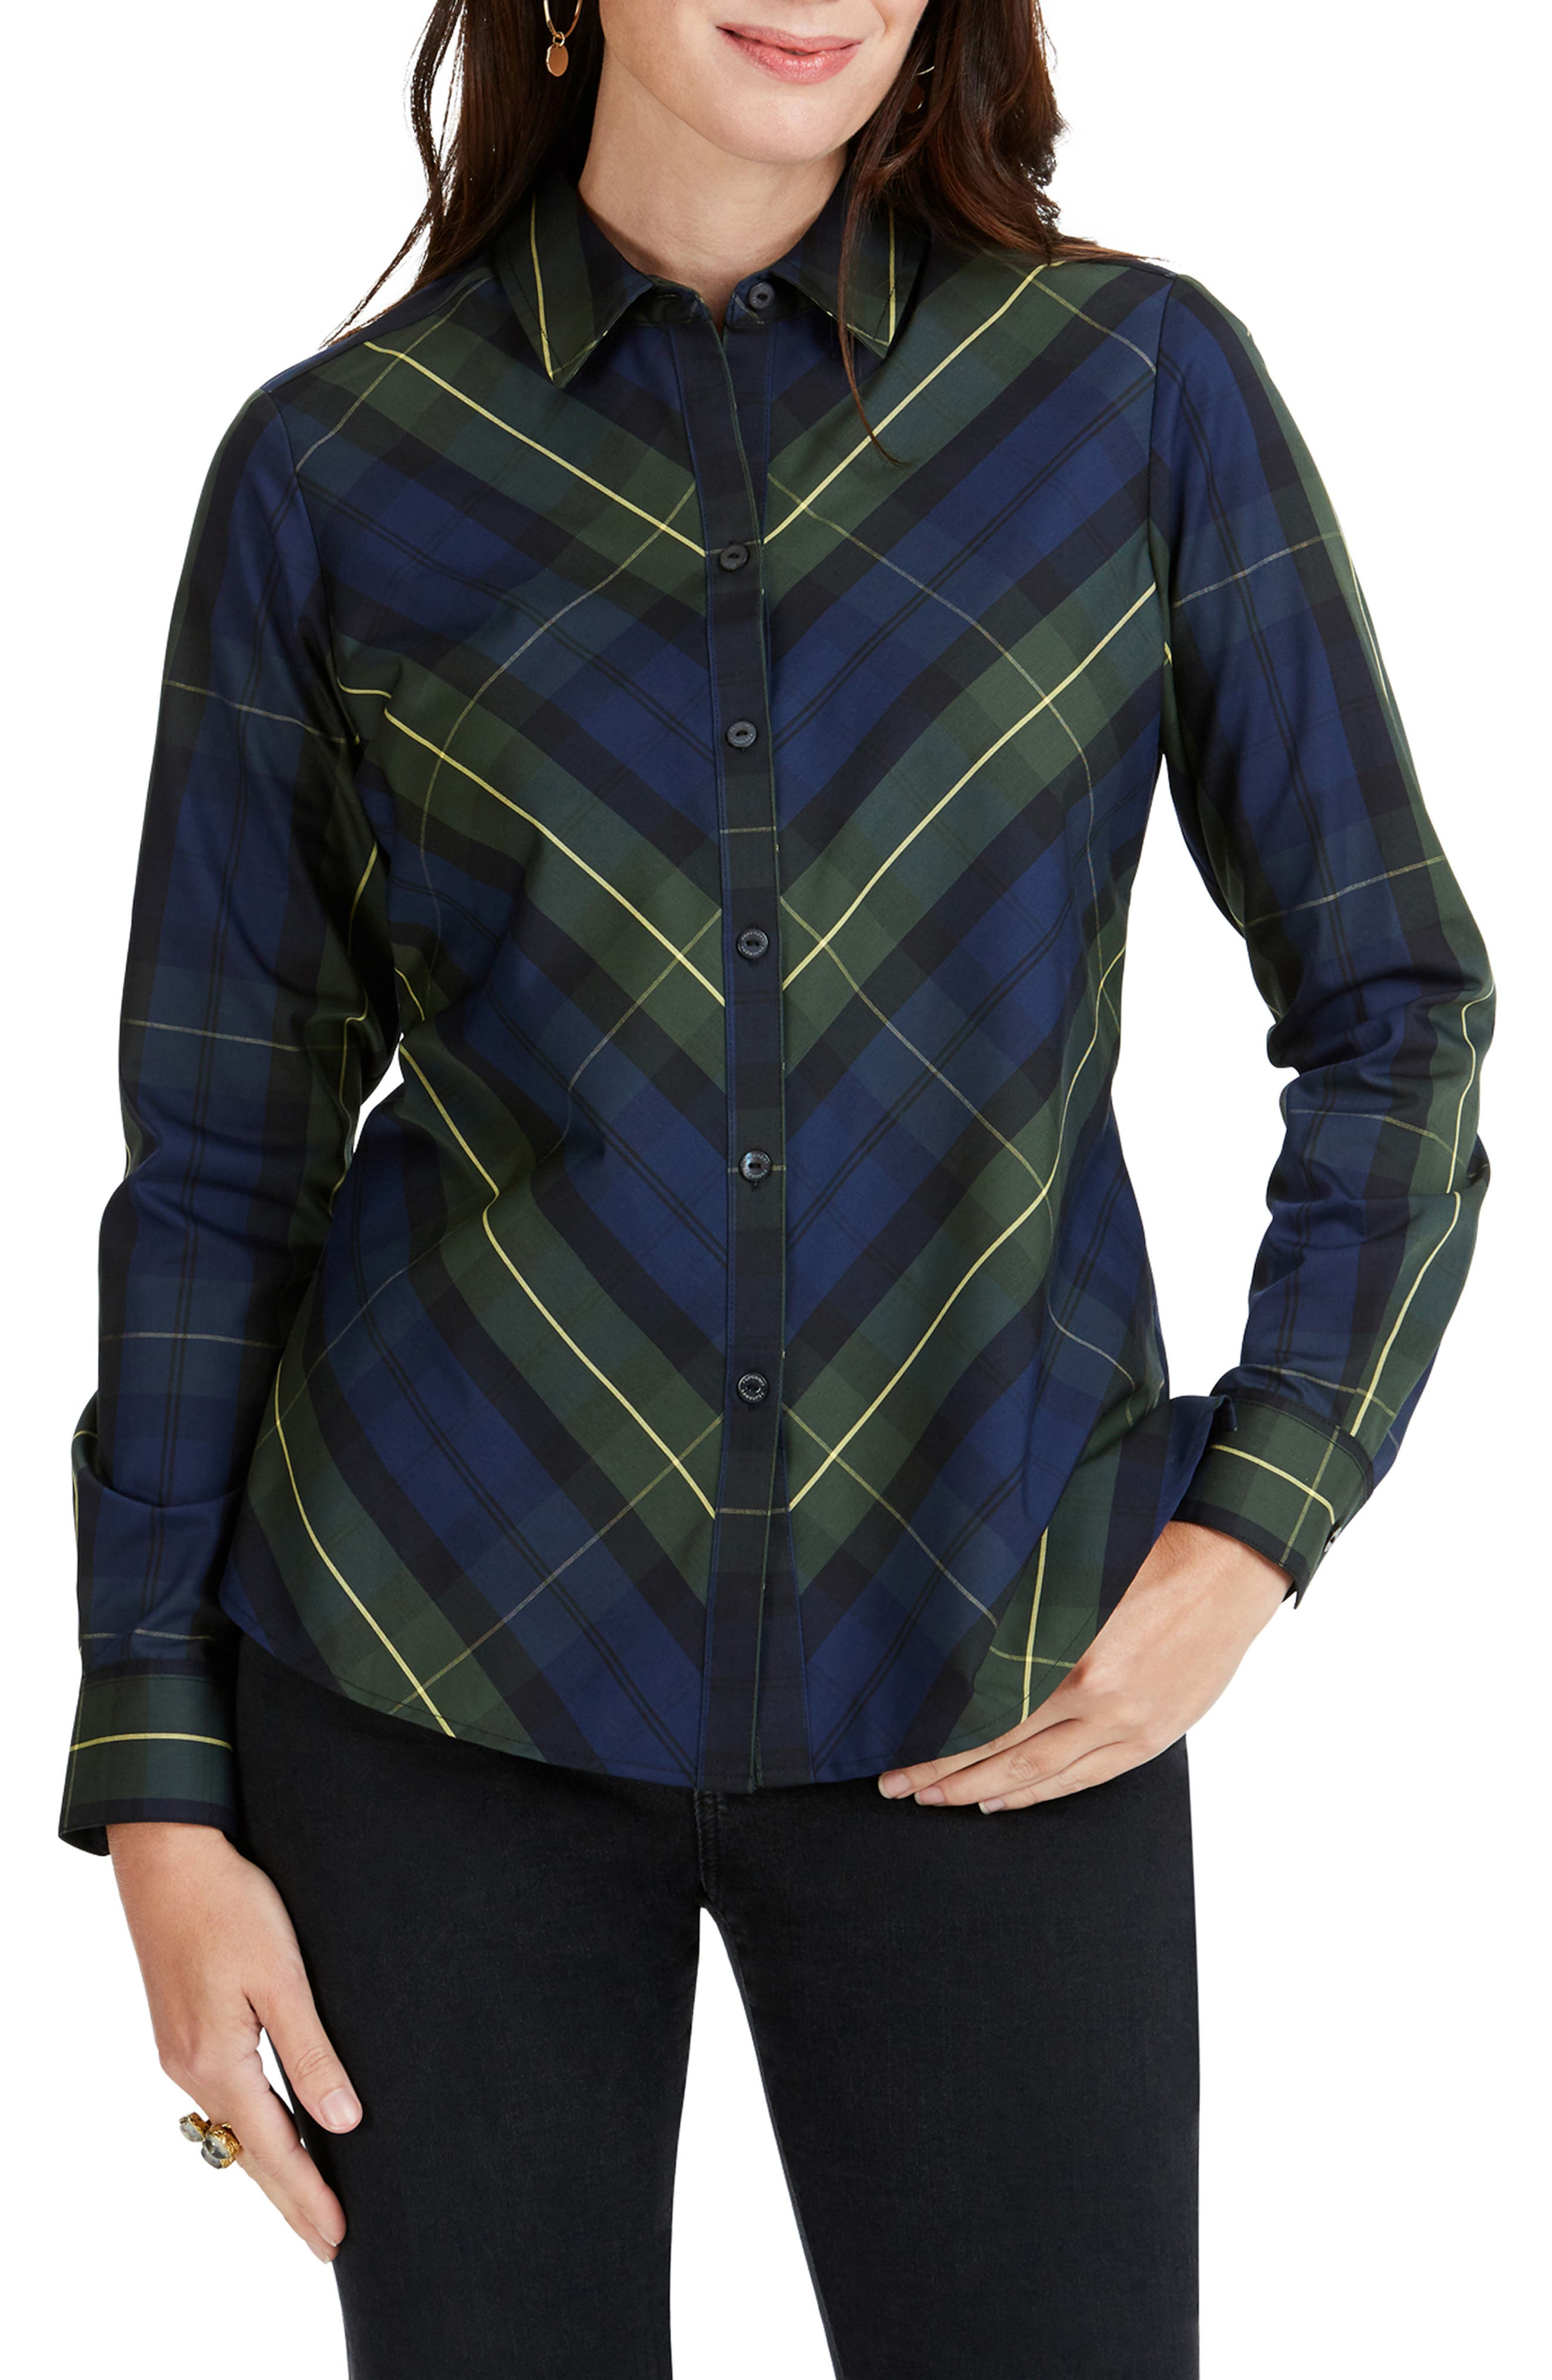 Foxcroft Tina Lenox Tartan Shirt, Blue